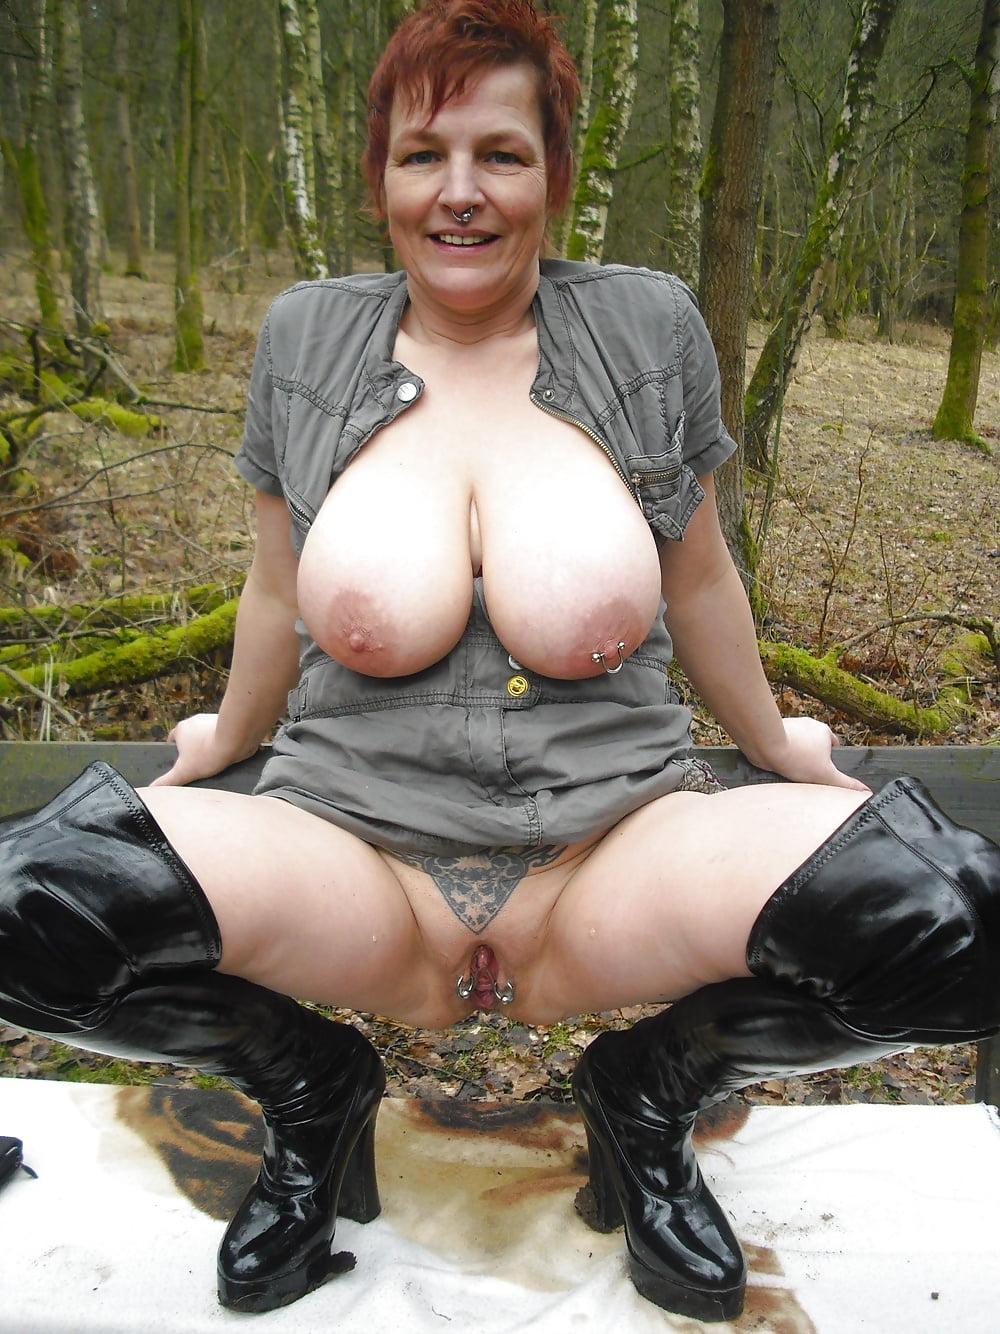 Best huge tits sites-6370